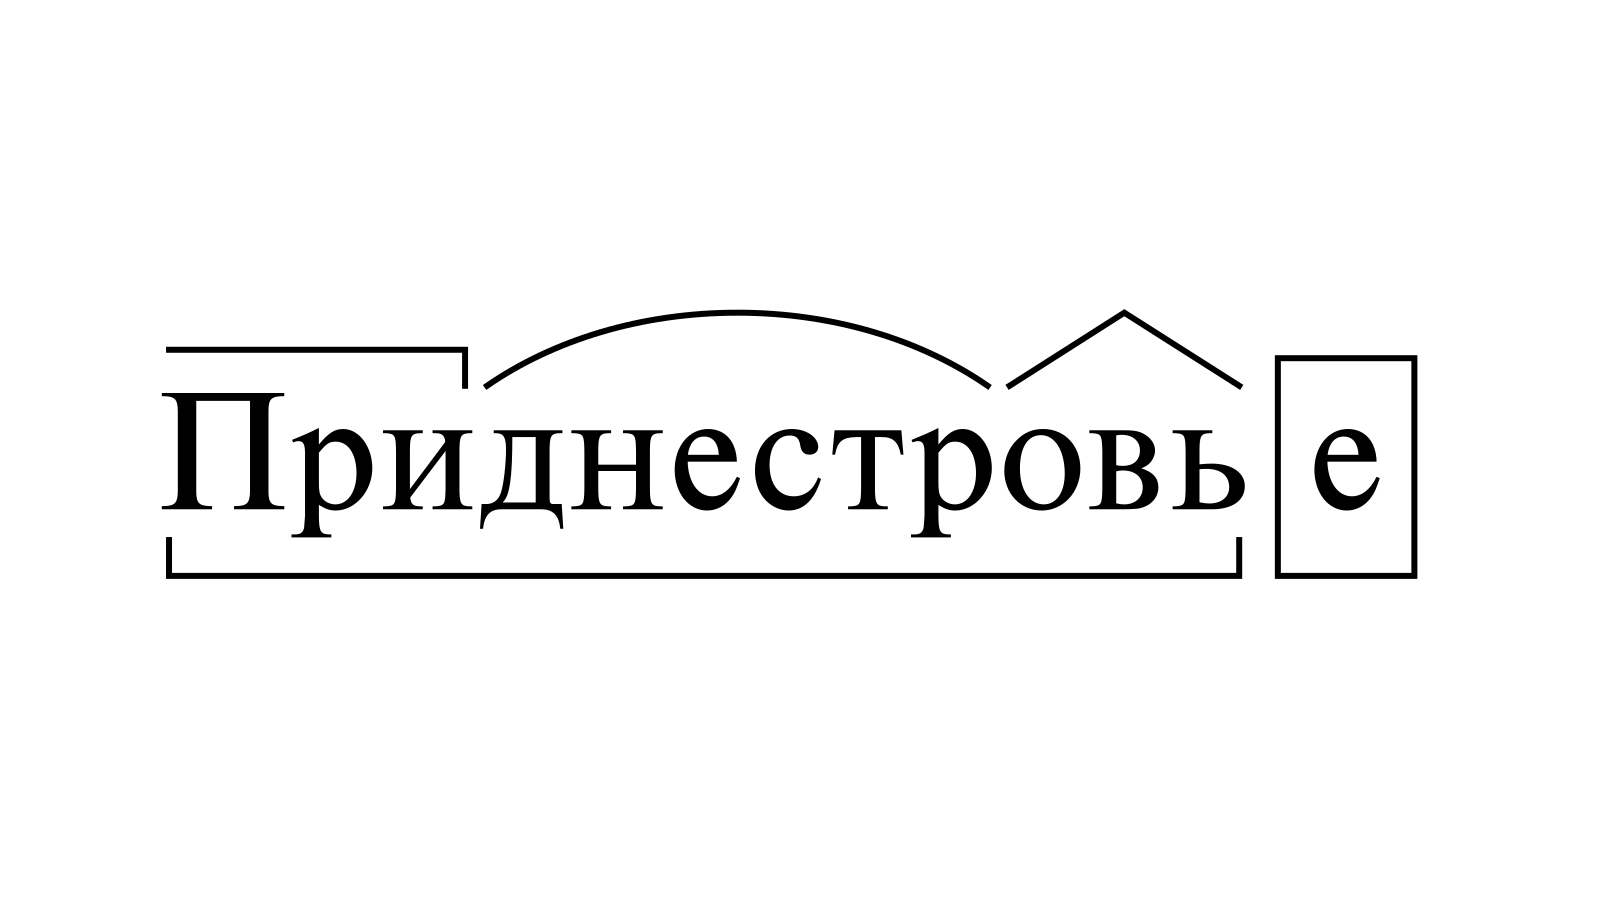 Разбор слова «Приднестровье» по составу